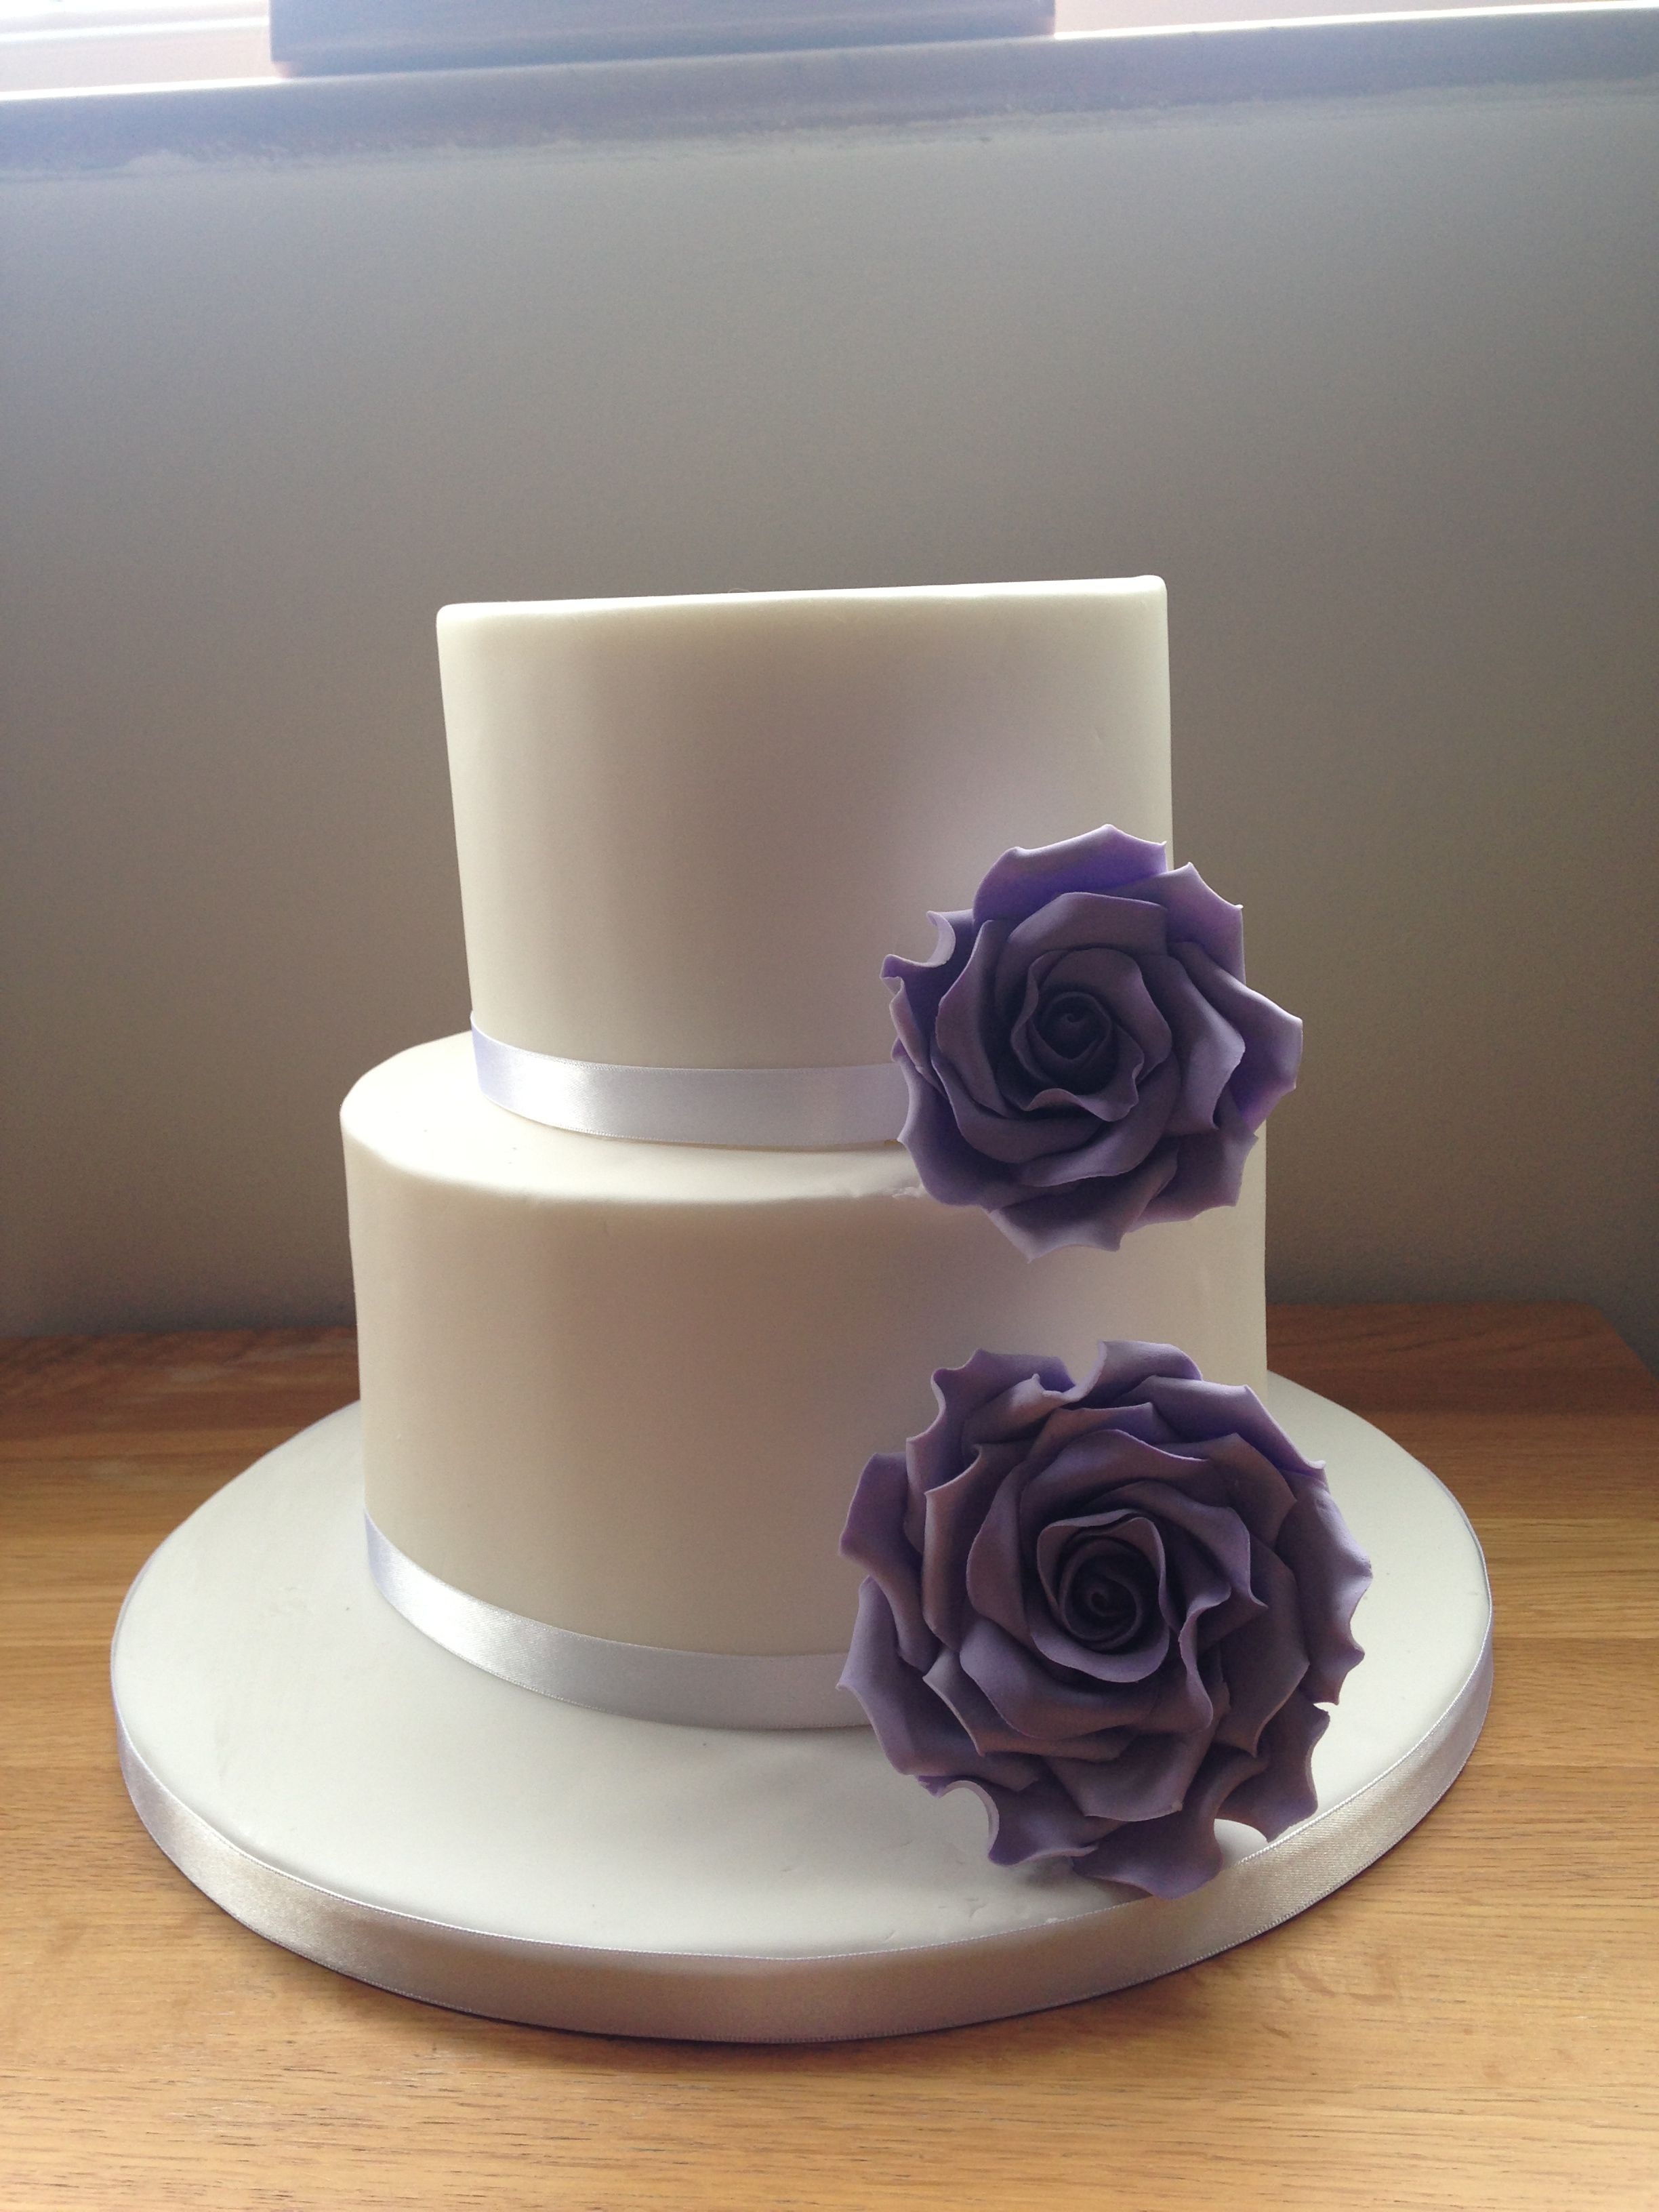 2 tier wedding cake purple roses flowers